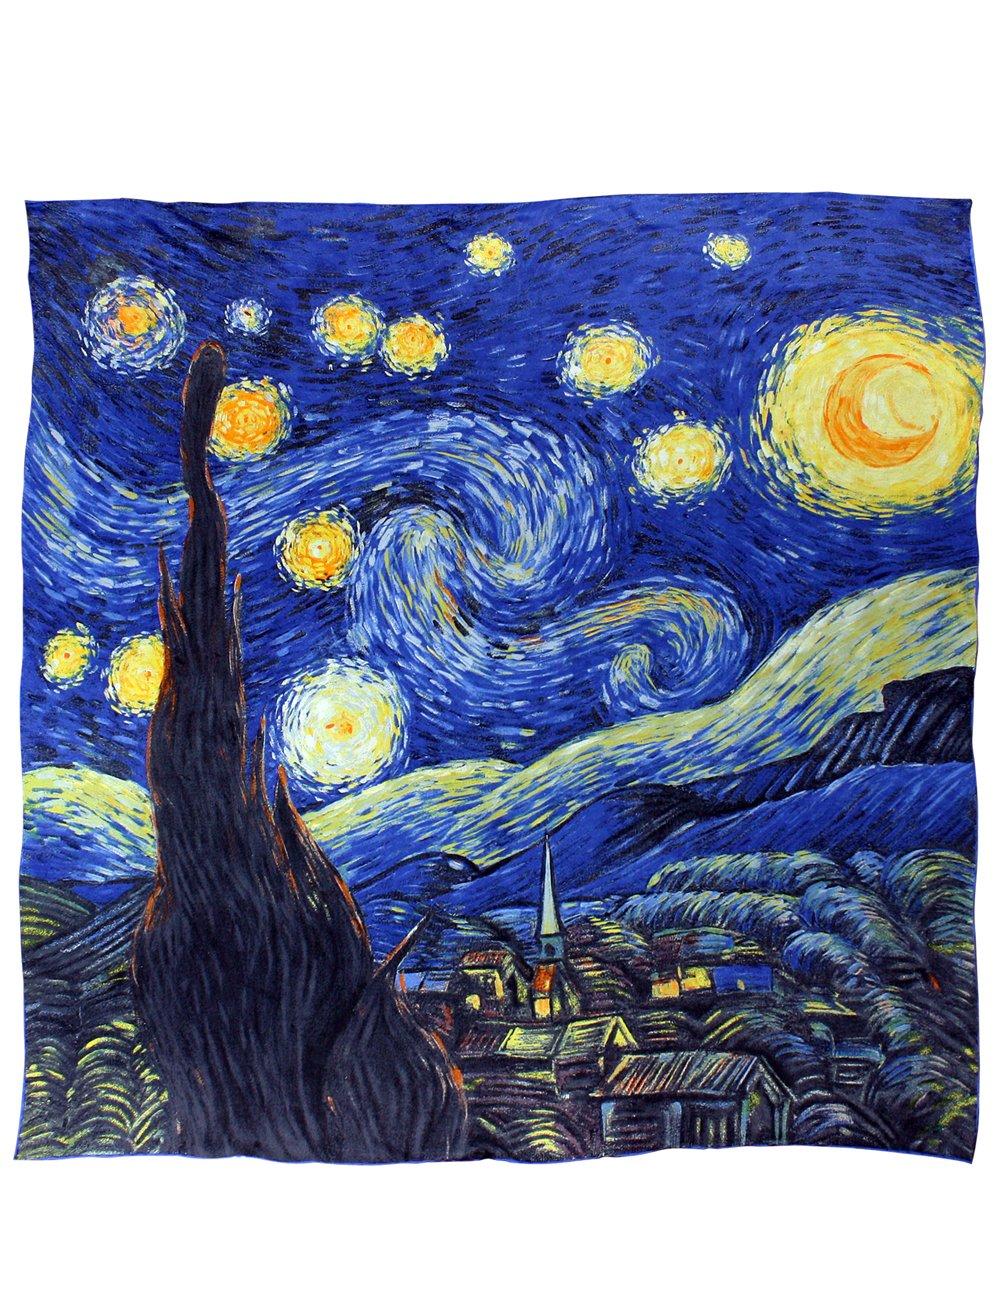 Dahlia Women's 100% Luxury Square Silk Scarf - Van Gogh''Starry Night'' - Blue by Dahlia